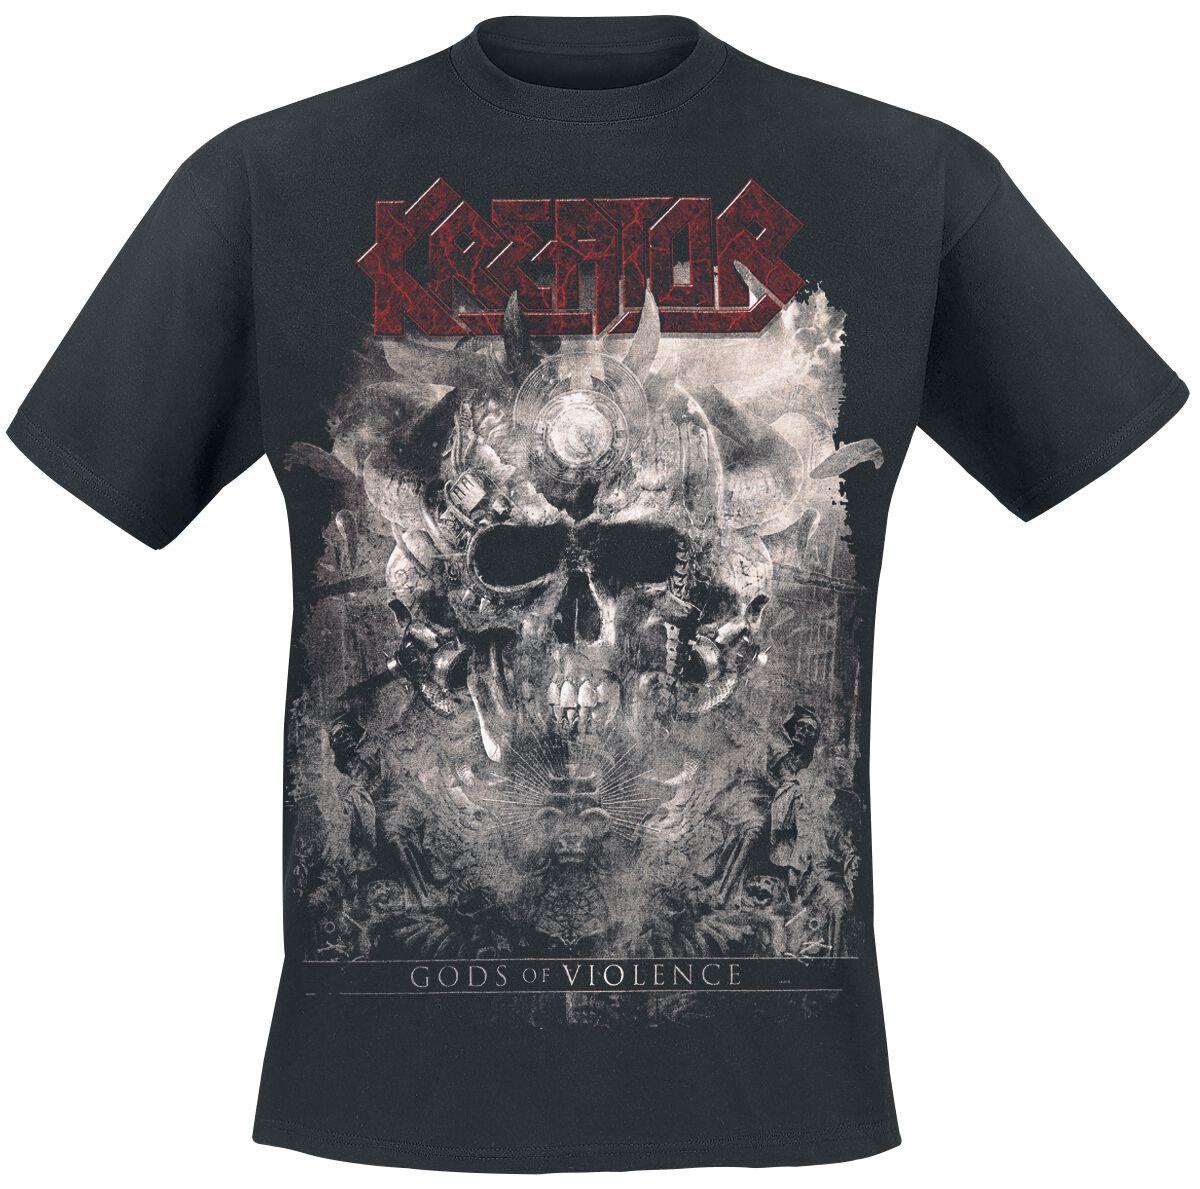 Zespoły - Koszulki - T-Shirt Kreator Gods Of Violence-Skulls T-Shirt czarny - 376150